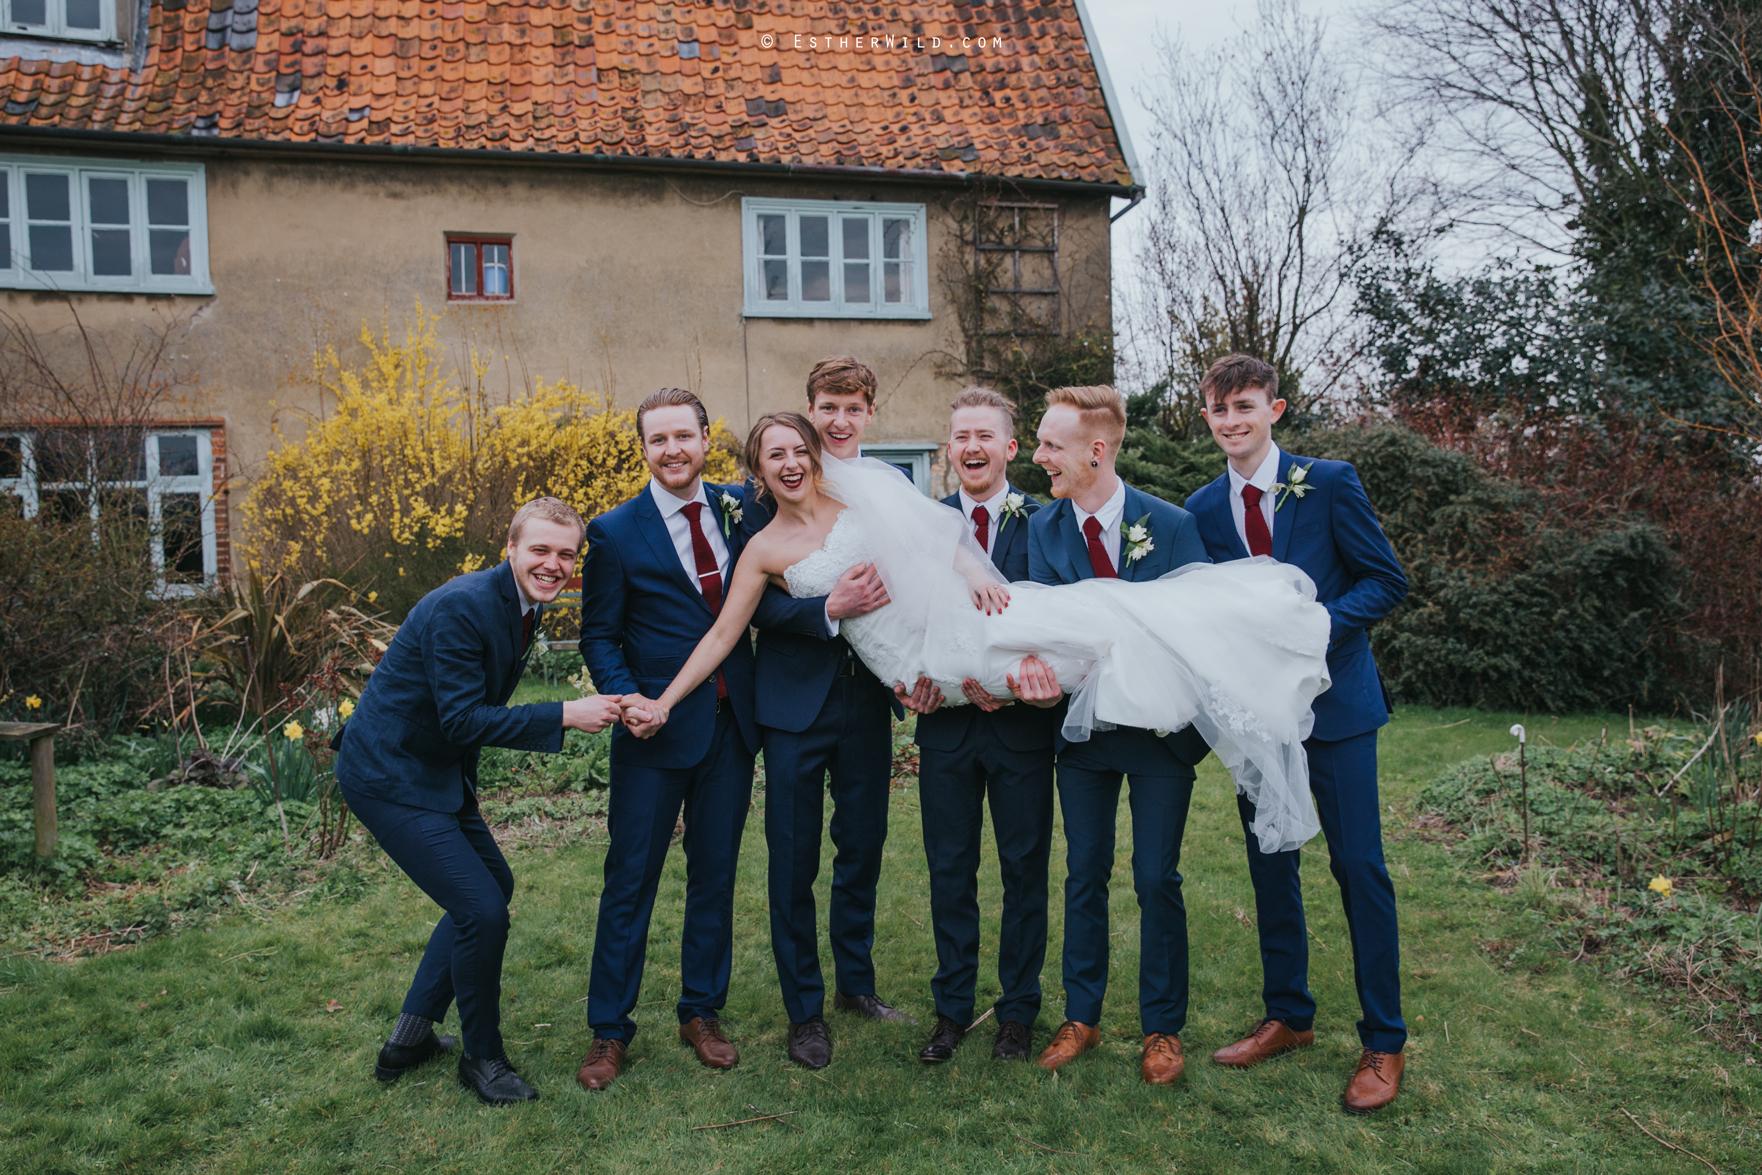 Glebe_Farm_Barn_Rustic_Norfolk_Wedding_Esther_Wild_Photographer_Copyright_IMG_2012.jpg